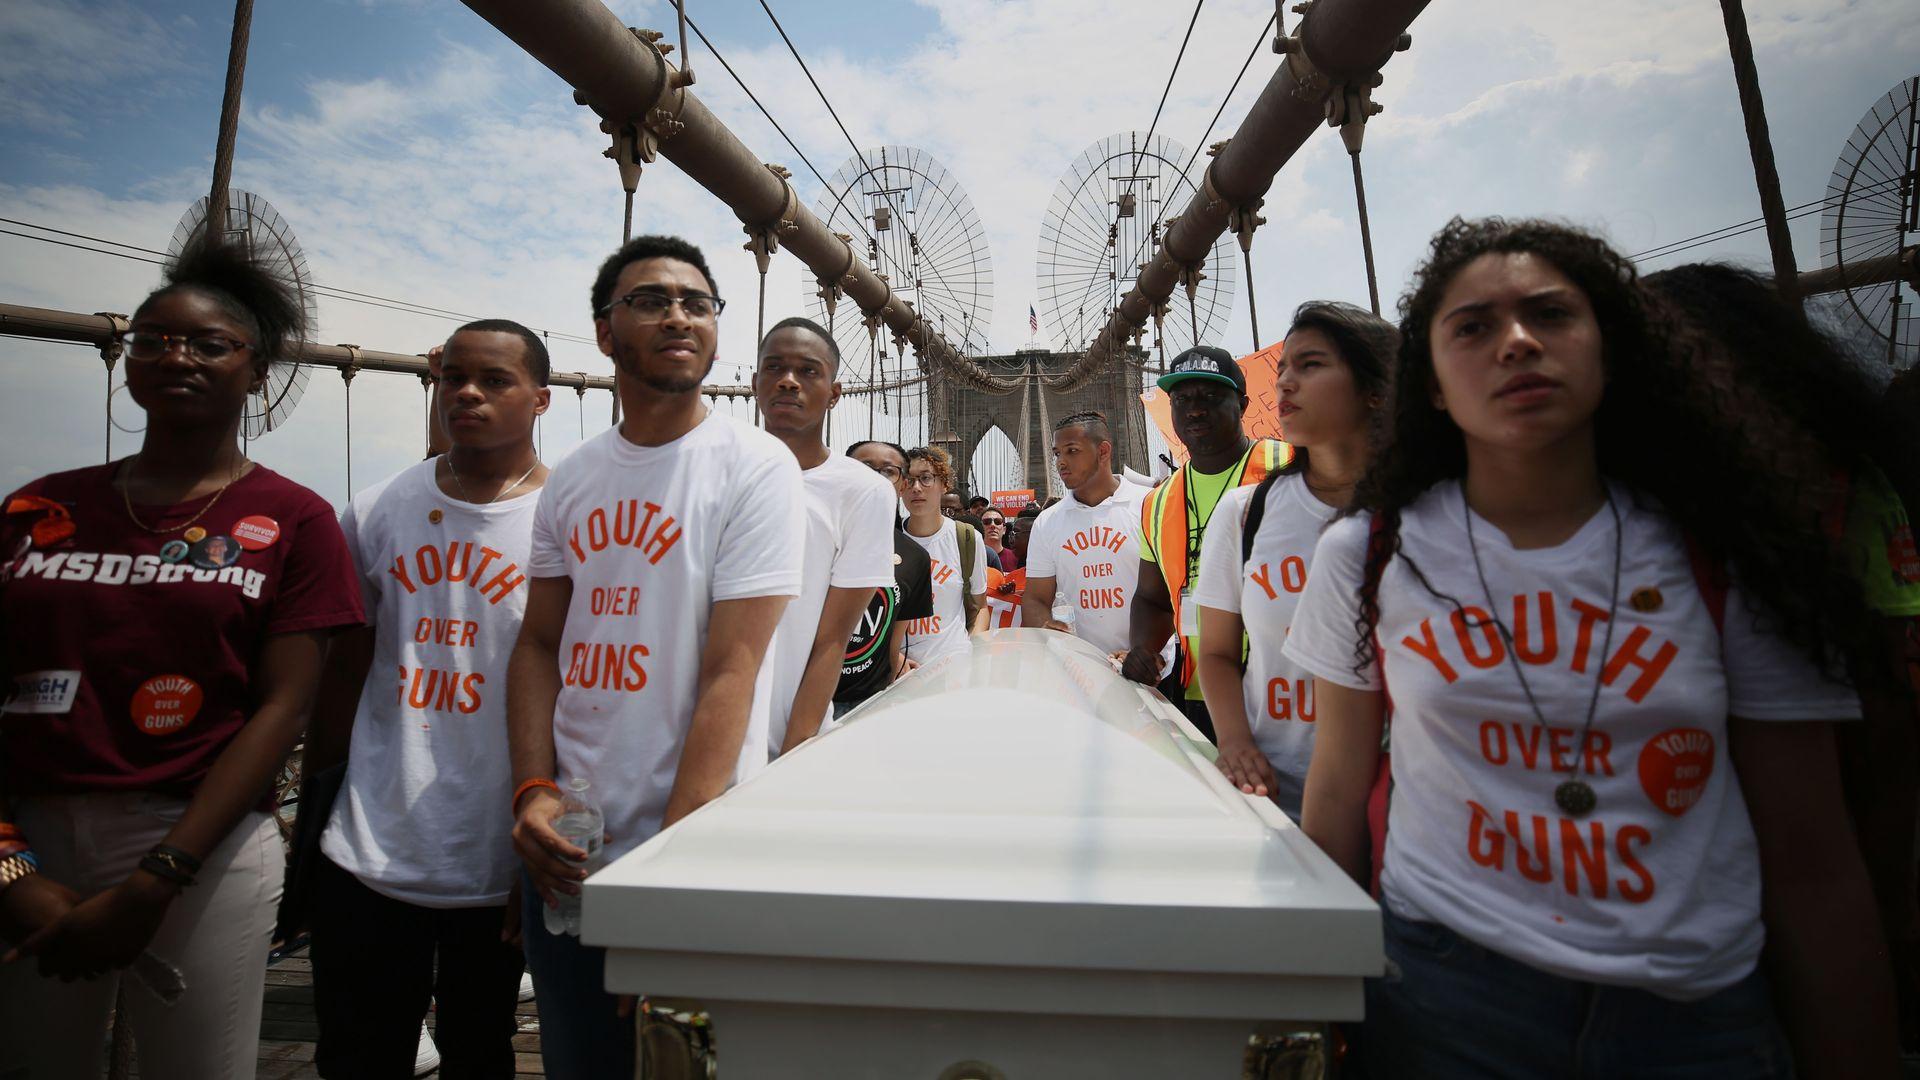 National Gun Violence Awareness Day march on Brooklyn Bridge in New York